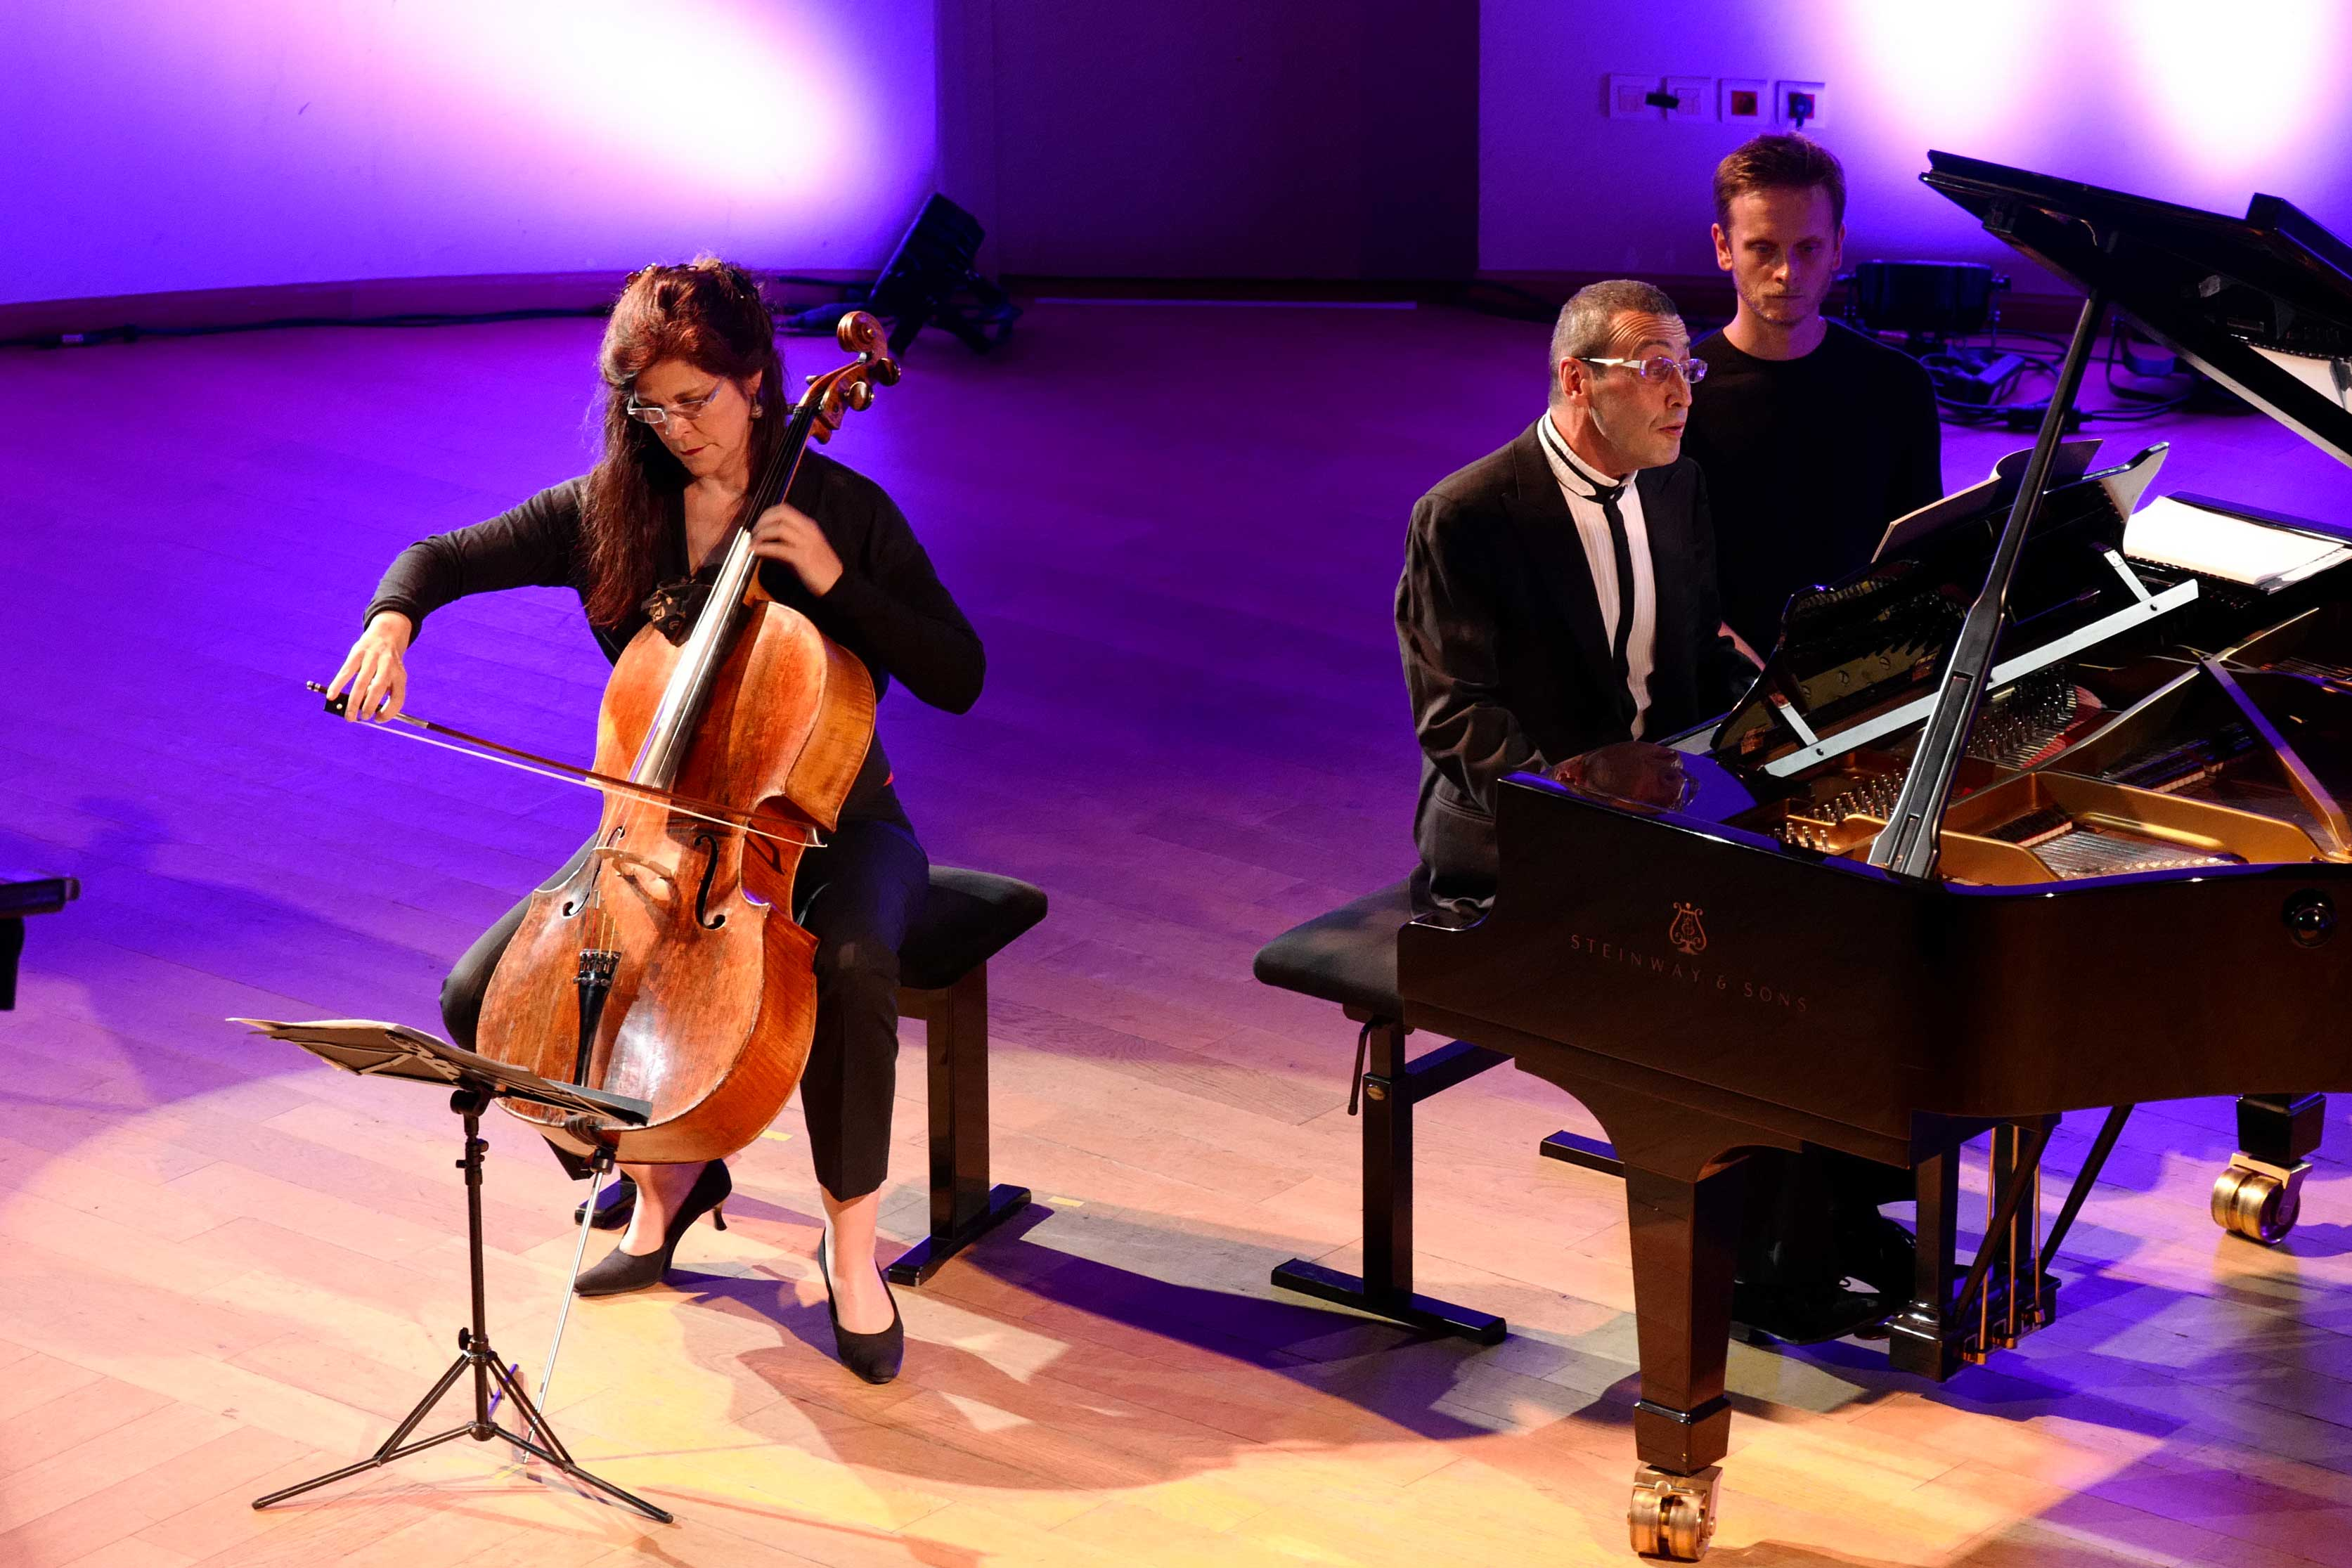 Sonia Wireder-Atherton, Alexander Paley et Loïc Serrurier au Festival Clef de Soleil